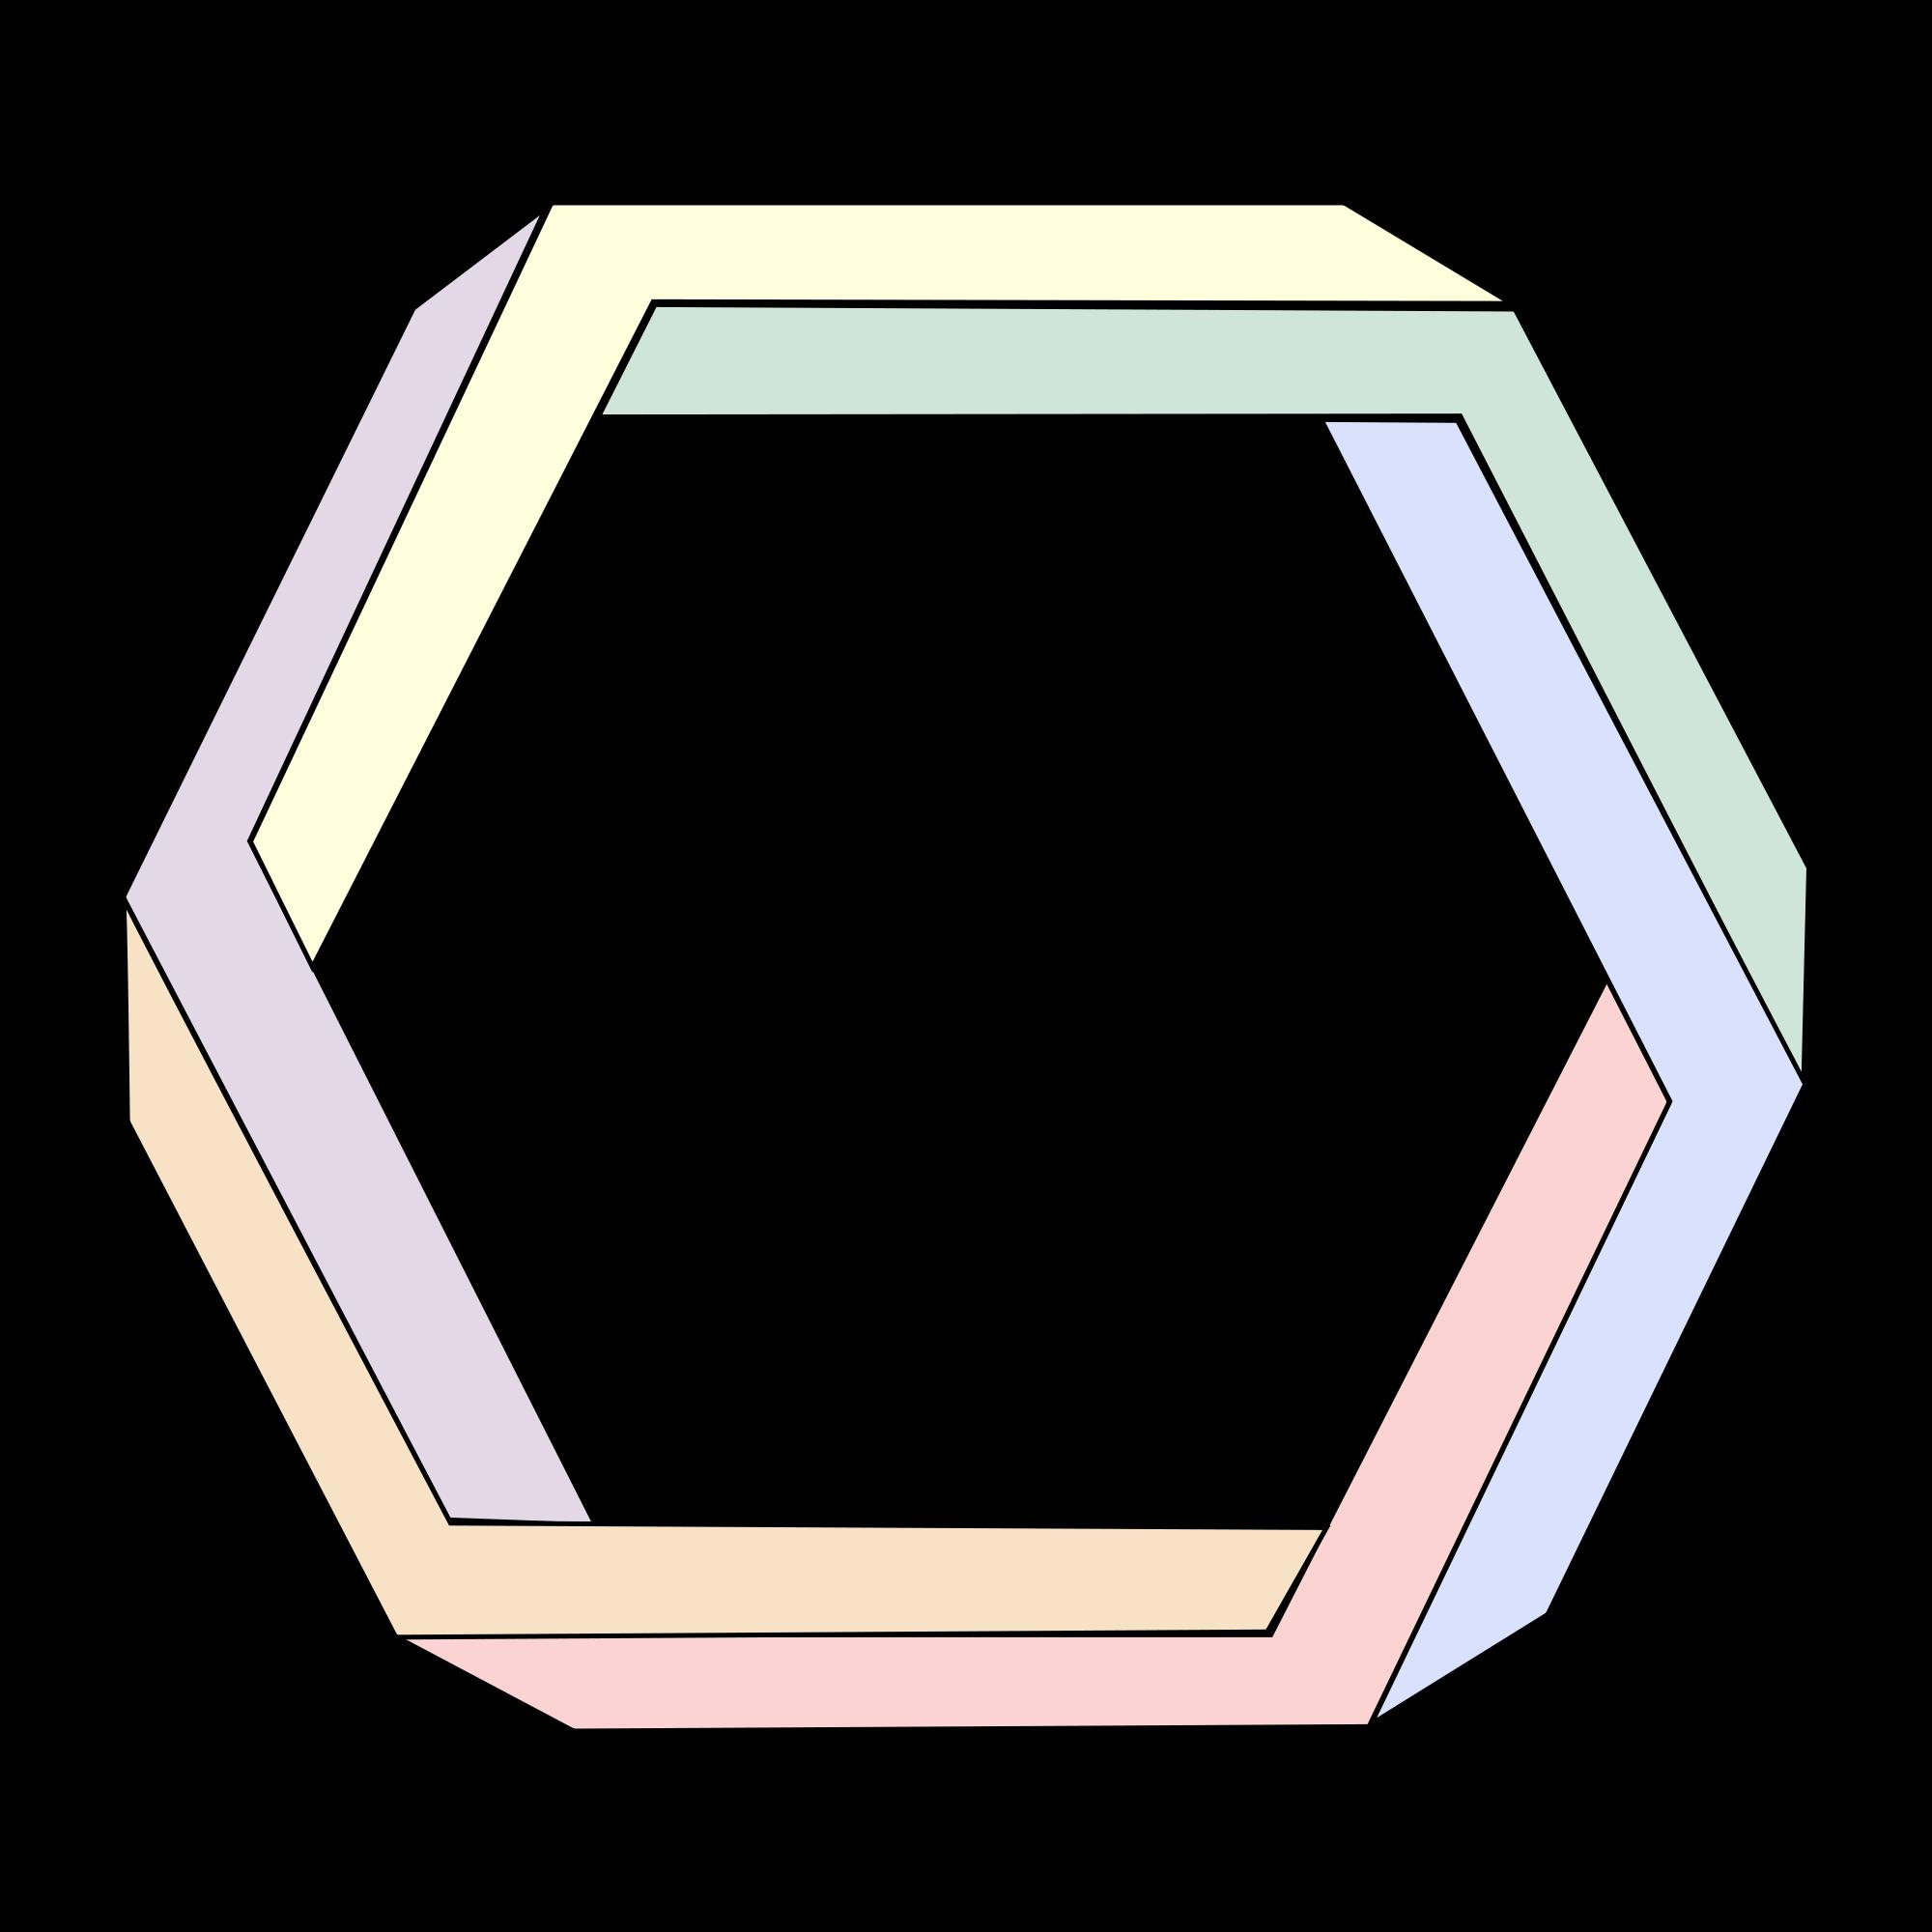 Hexagon svg #8, Download drawings